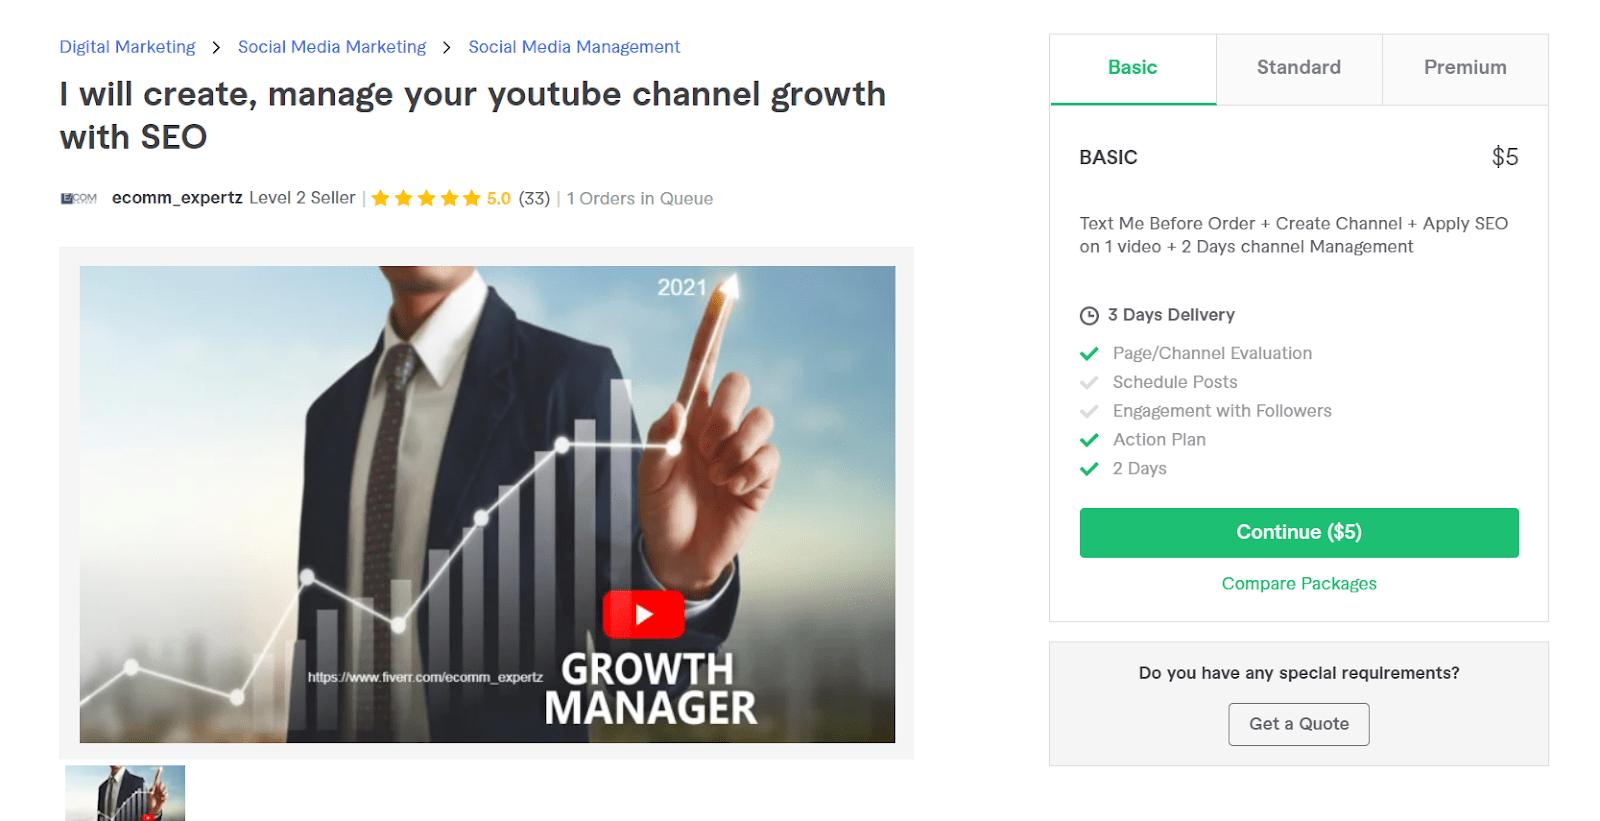 Fiverr screenshot - ecomm_expertz youtube channel manager gig